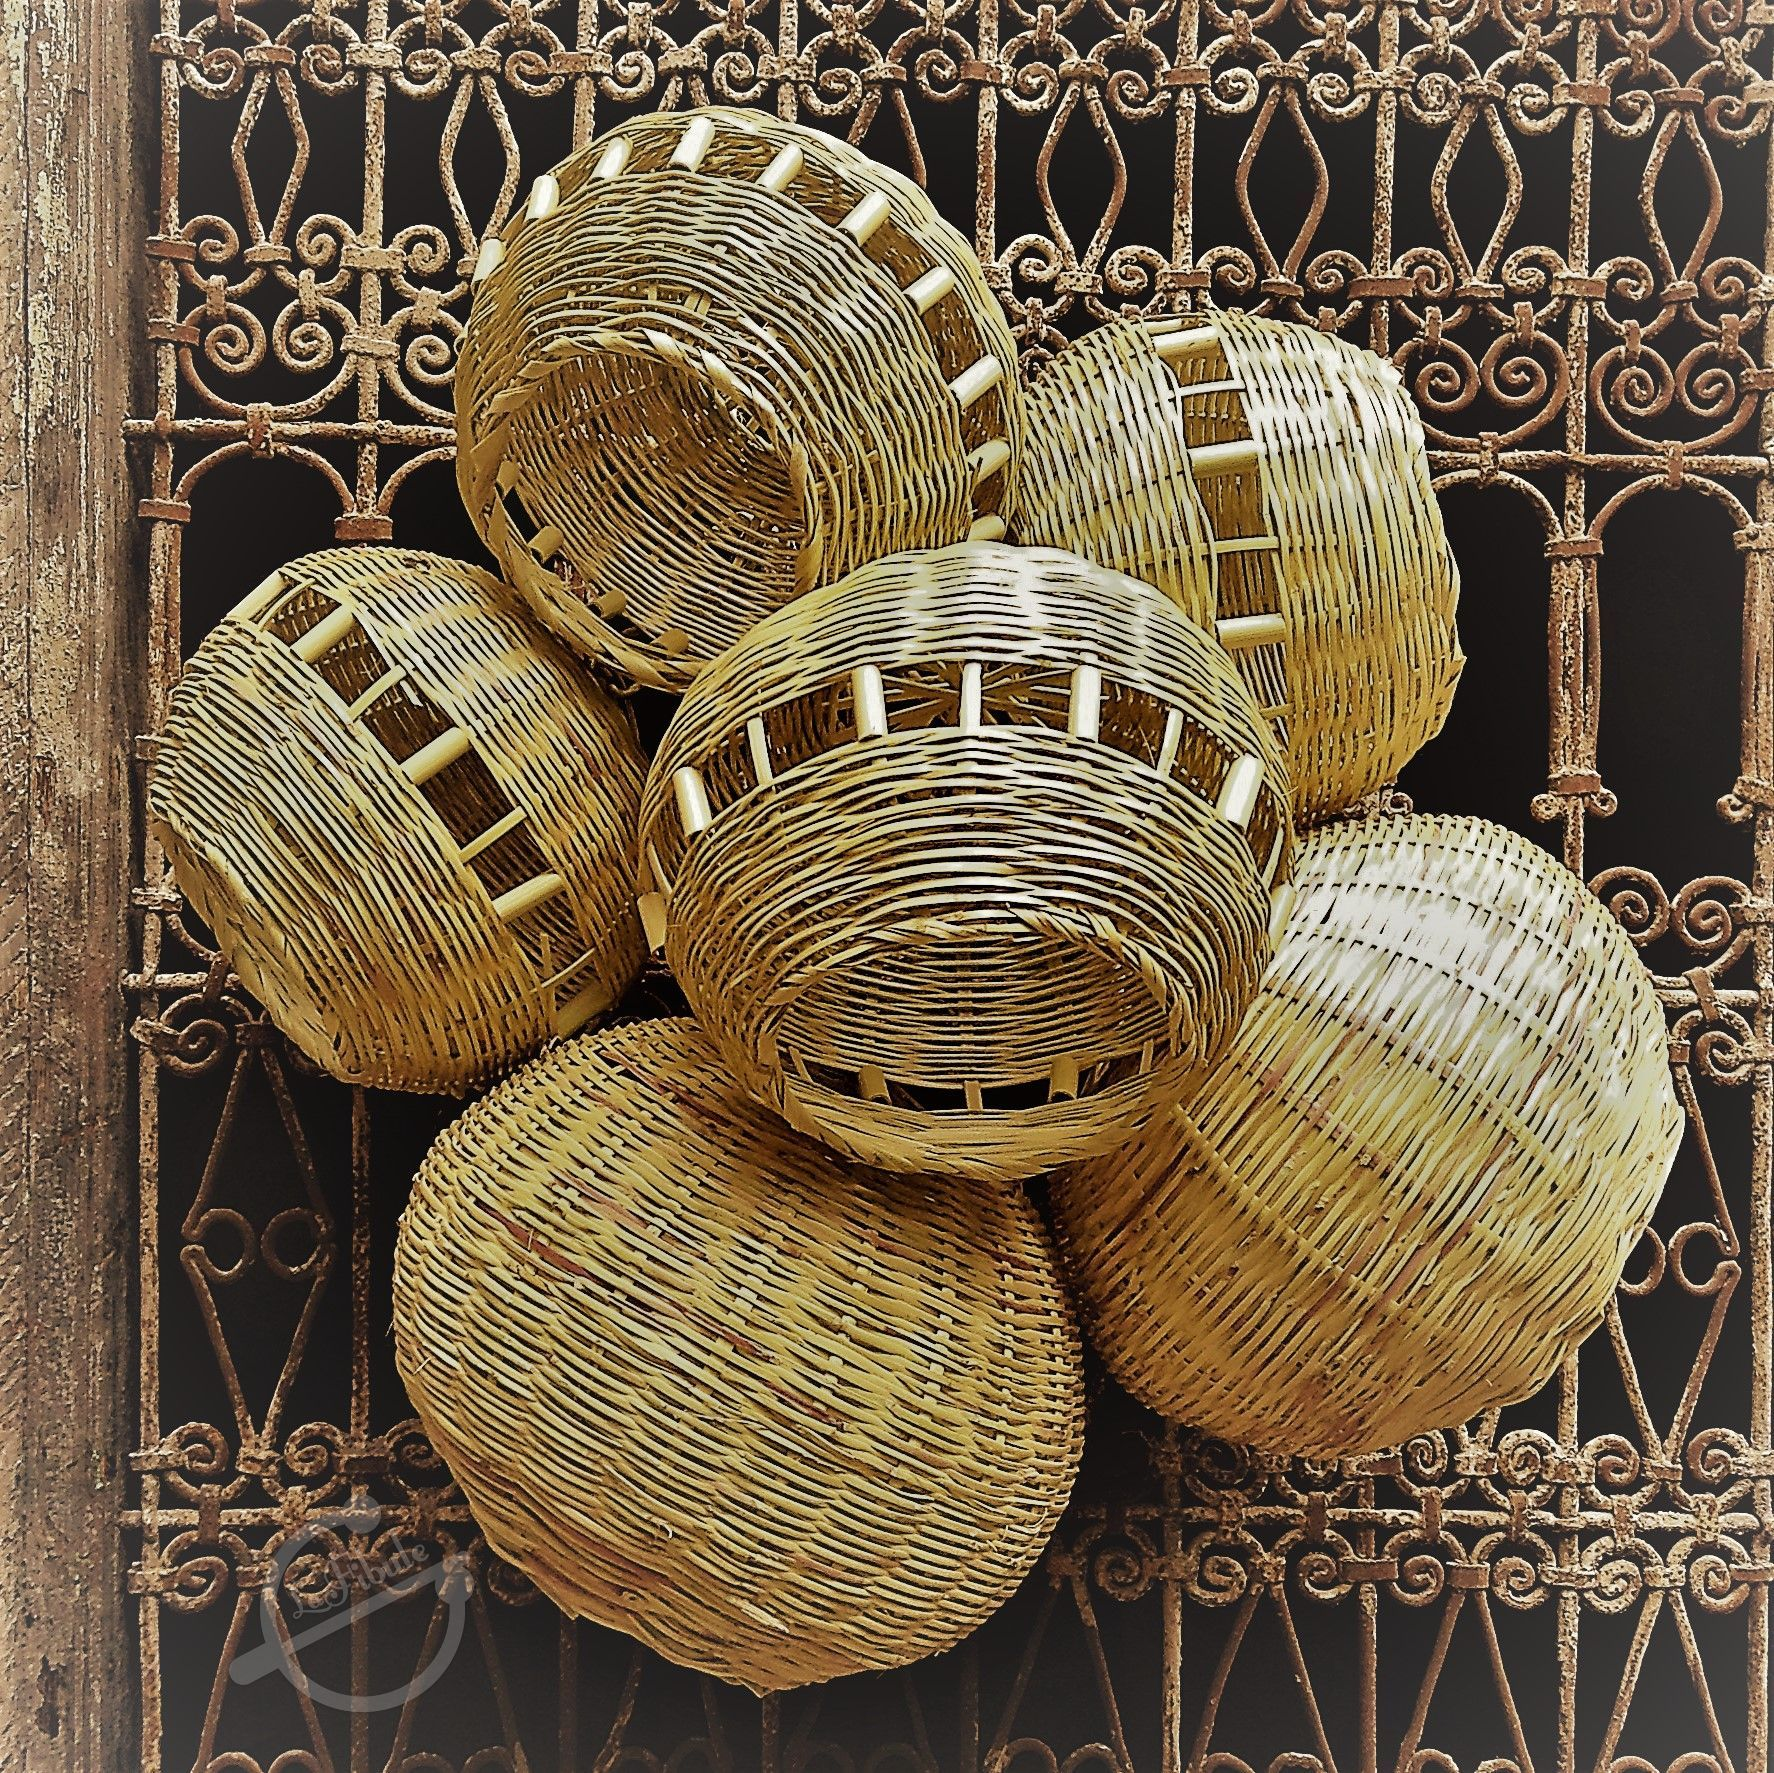 Lustre Osier Naturel Luminaire Decoration Ethnique Artisanat Marocain